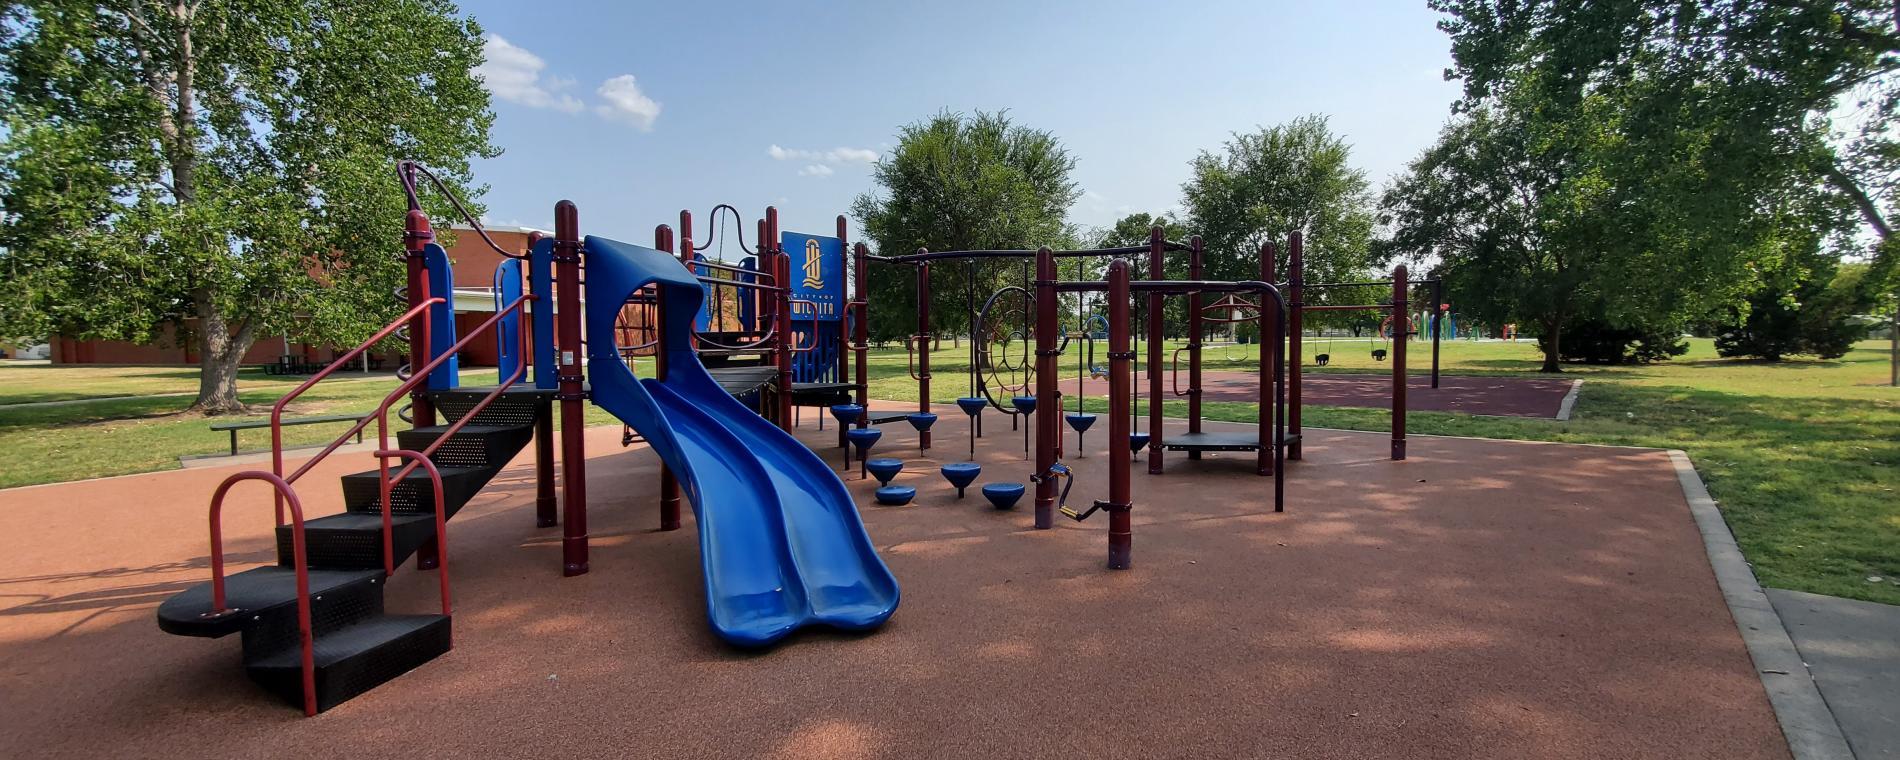 Osage Park - Playground